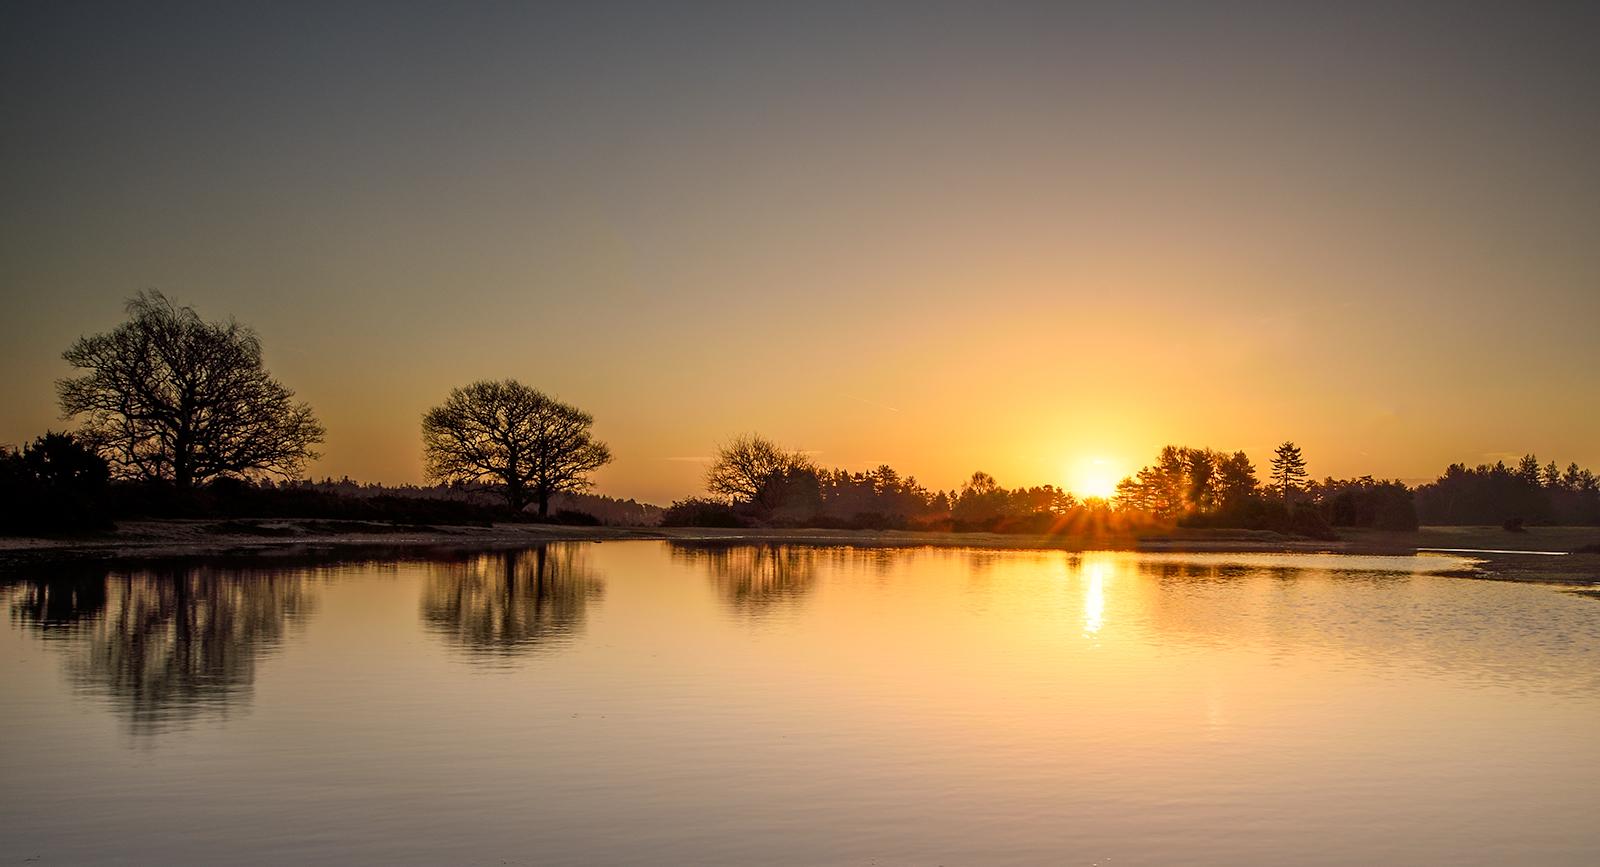 Sunrise Mogshade Pond, 2nd January 2017